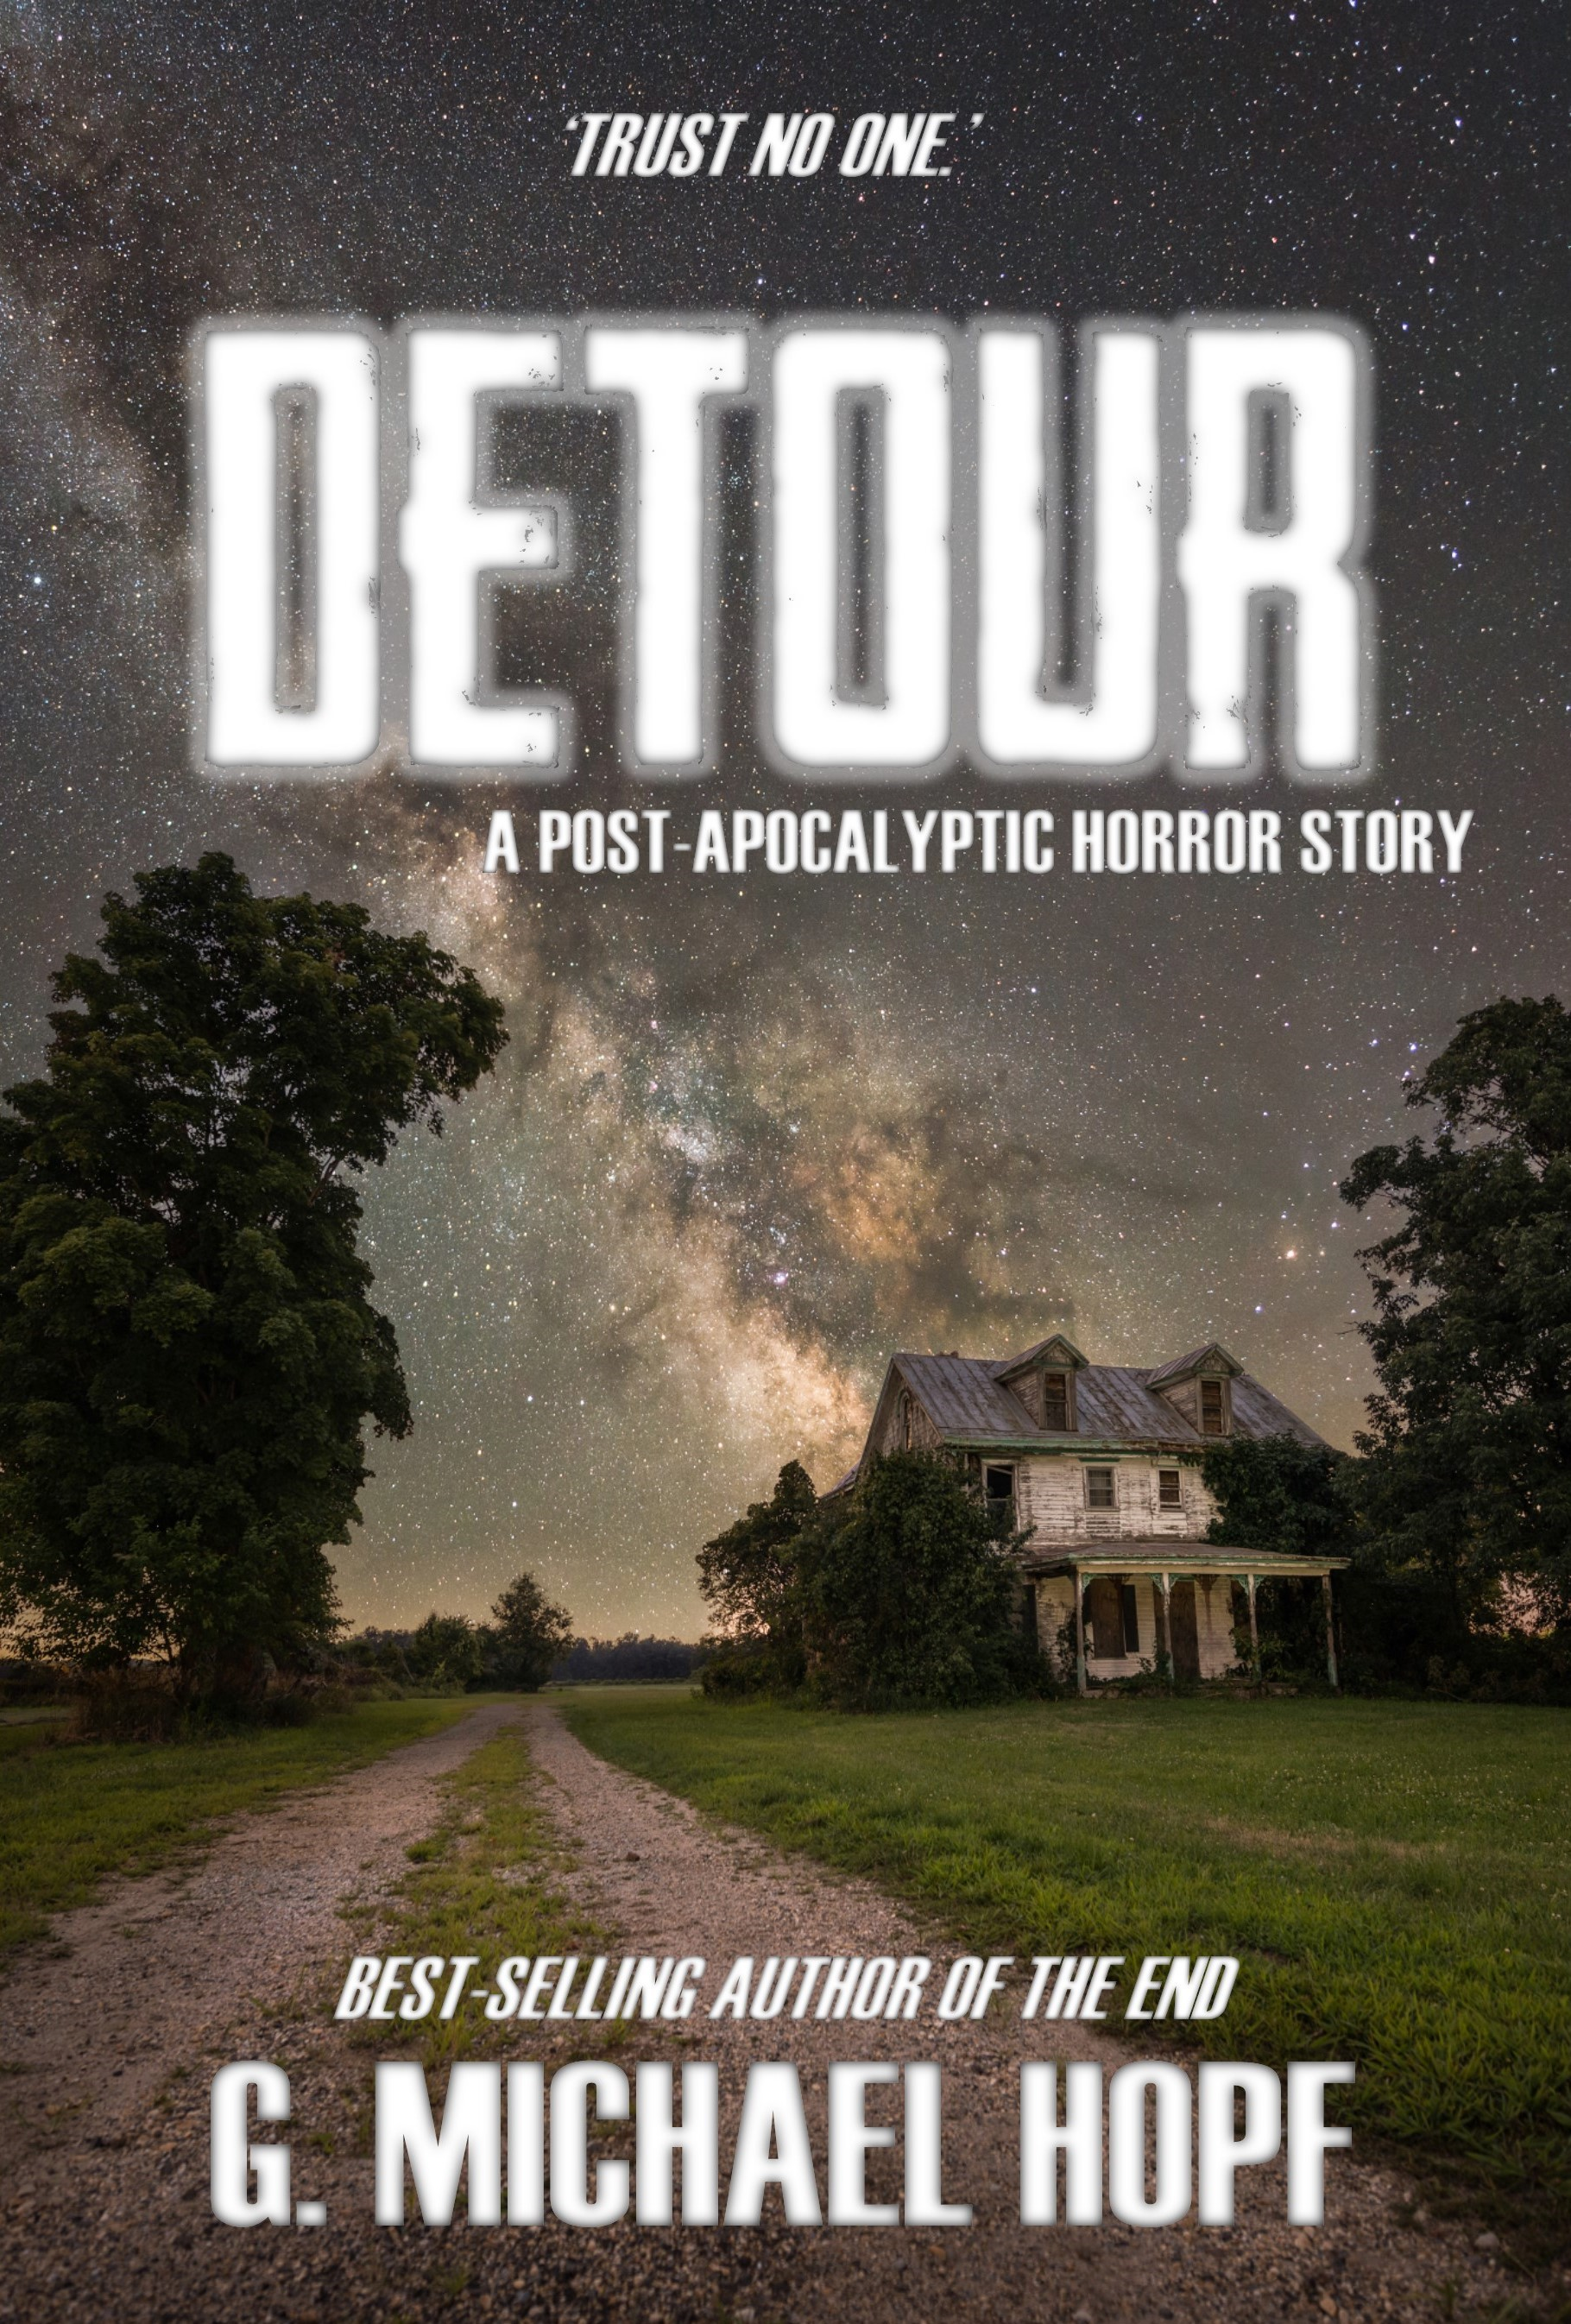 DETOUR COVER FINAL